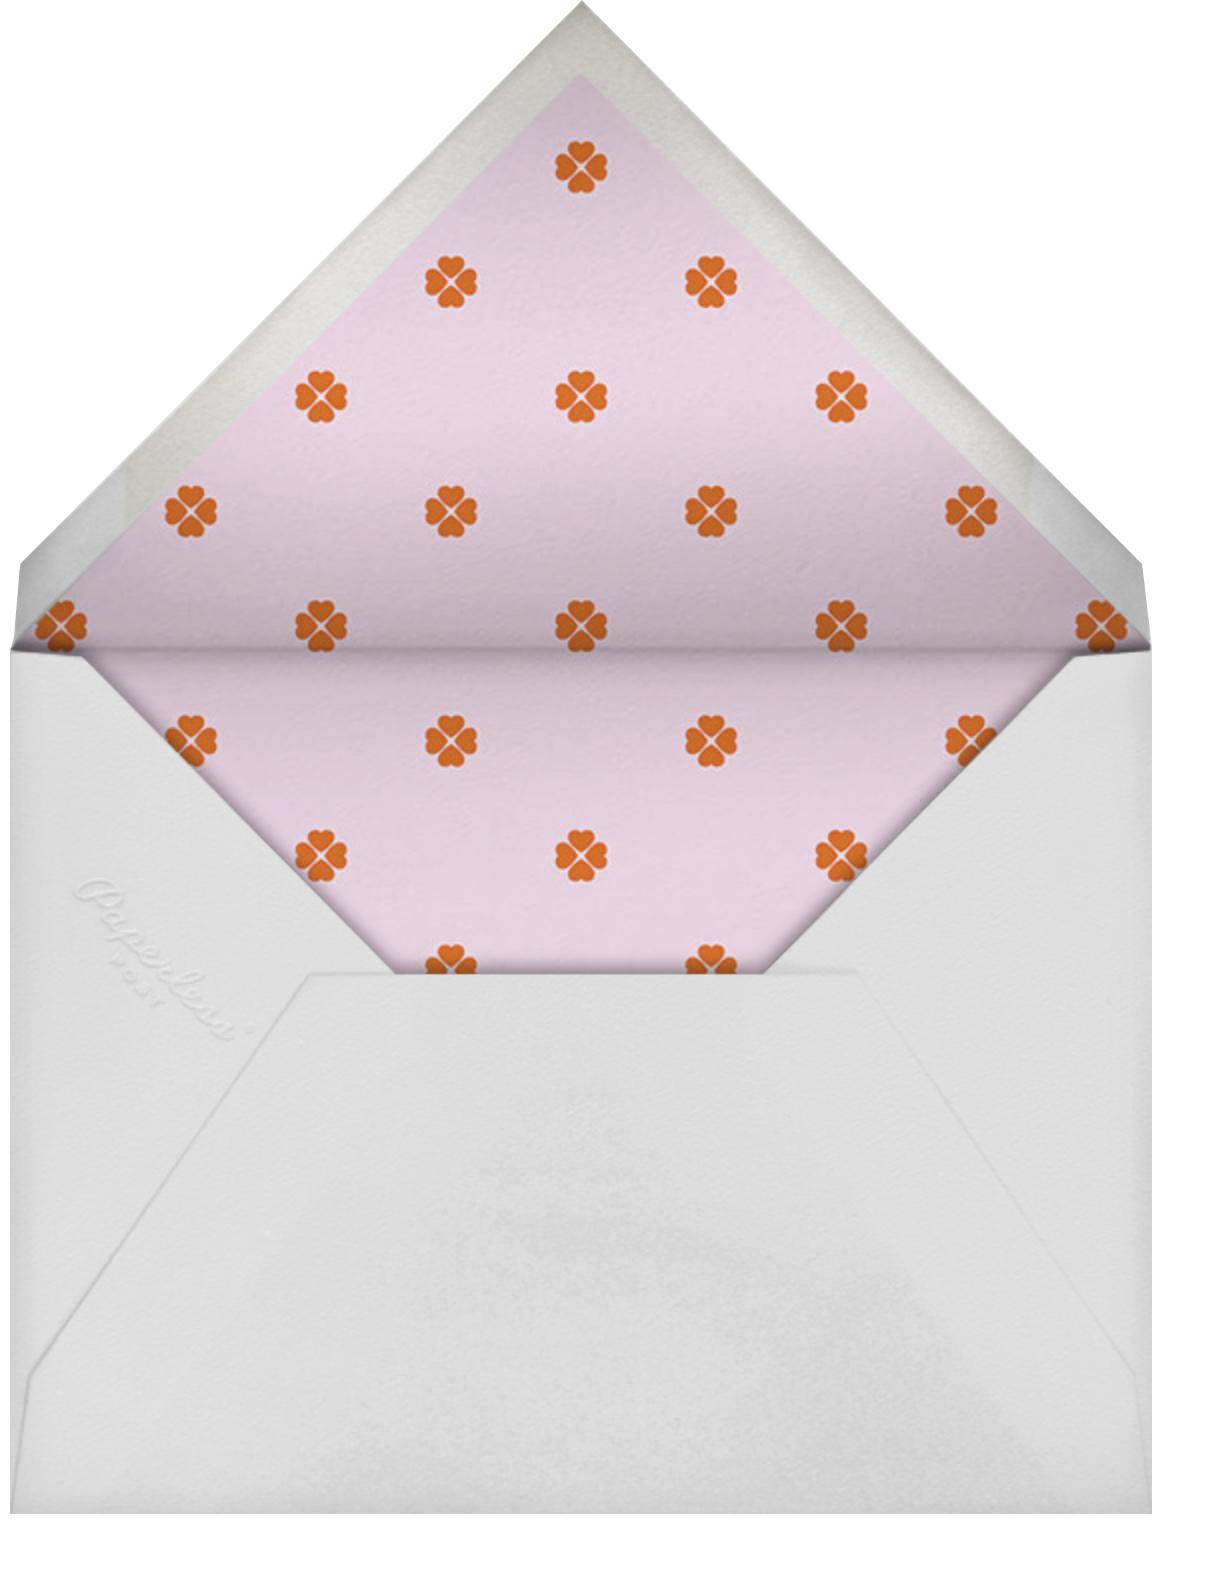 Two Halves - Hydrangea/Longhorn - kate spade new york - Adult birthday - envelope back